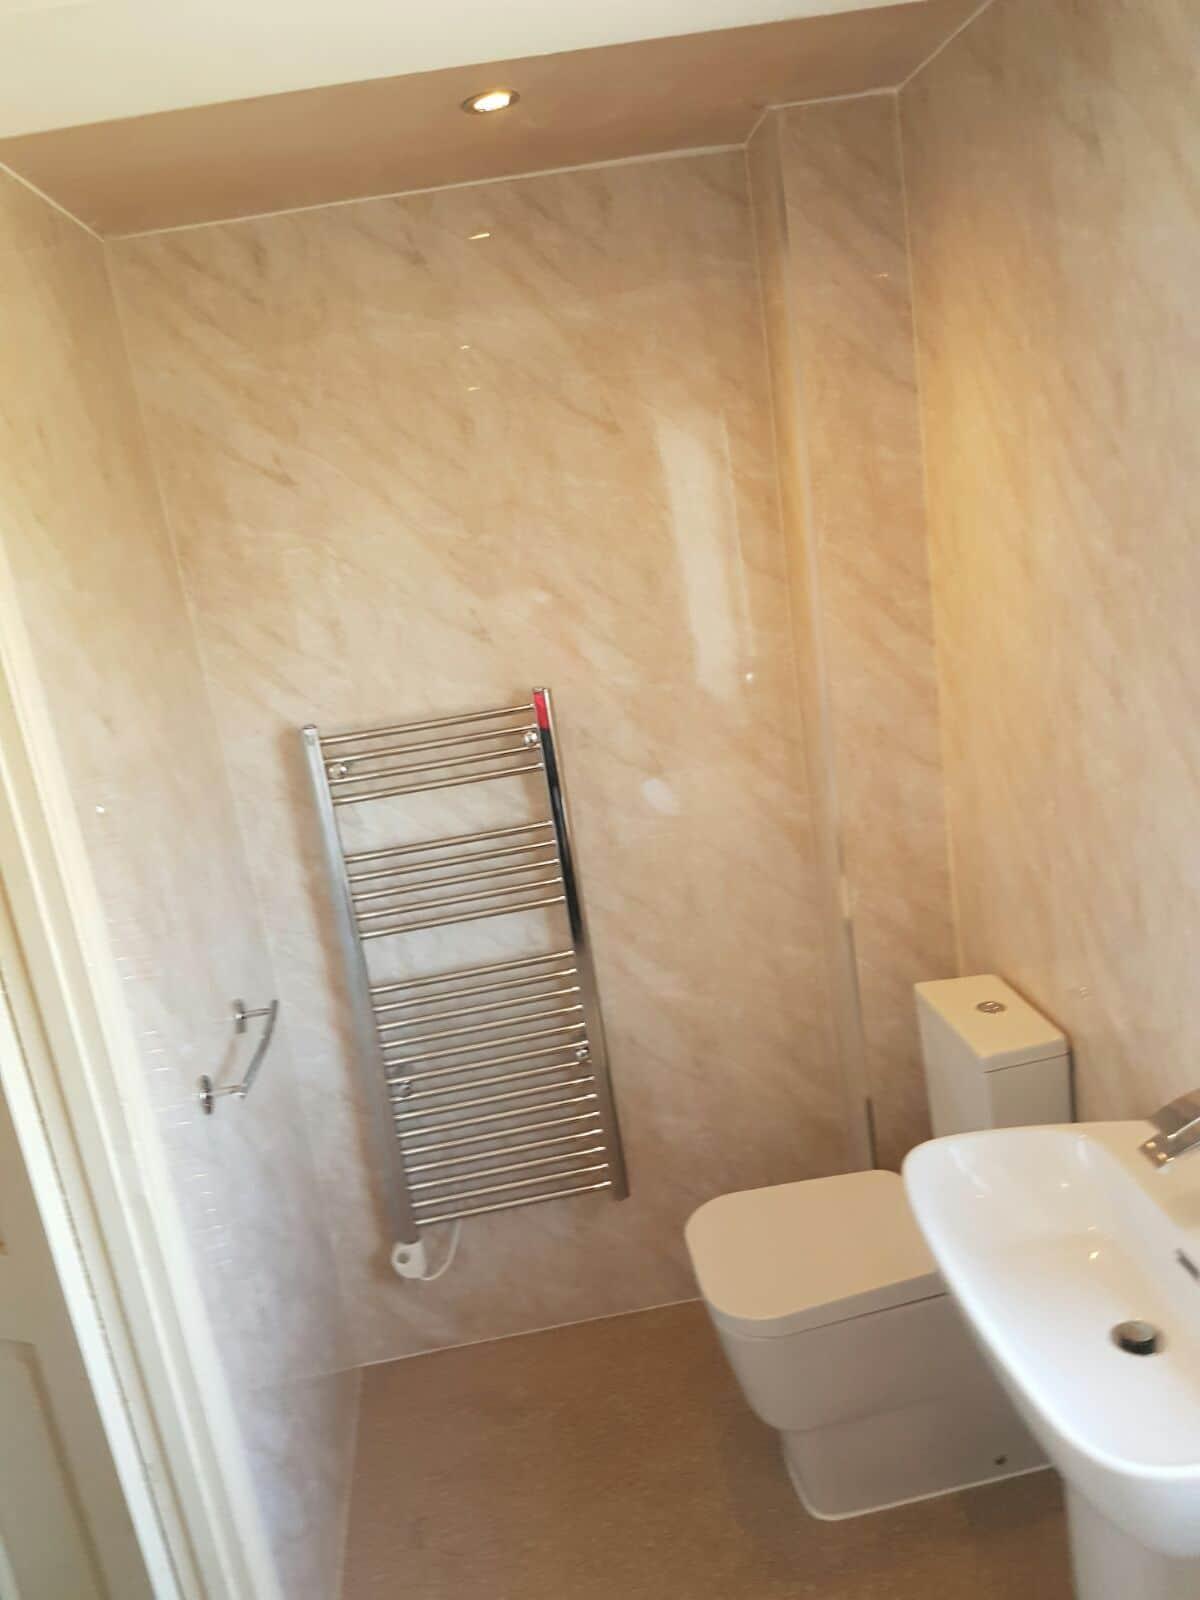 Pergamon Marble - 3 Wall Shower Panel Kit | Igloo Surfaces